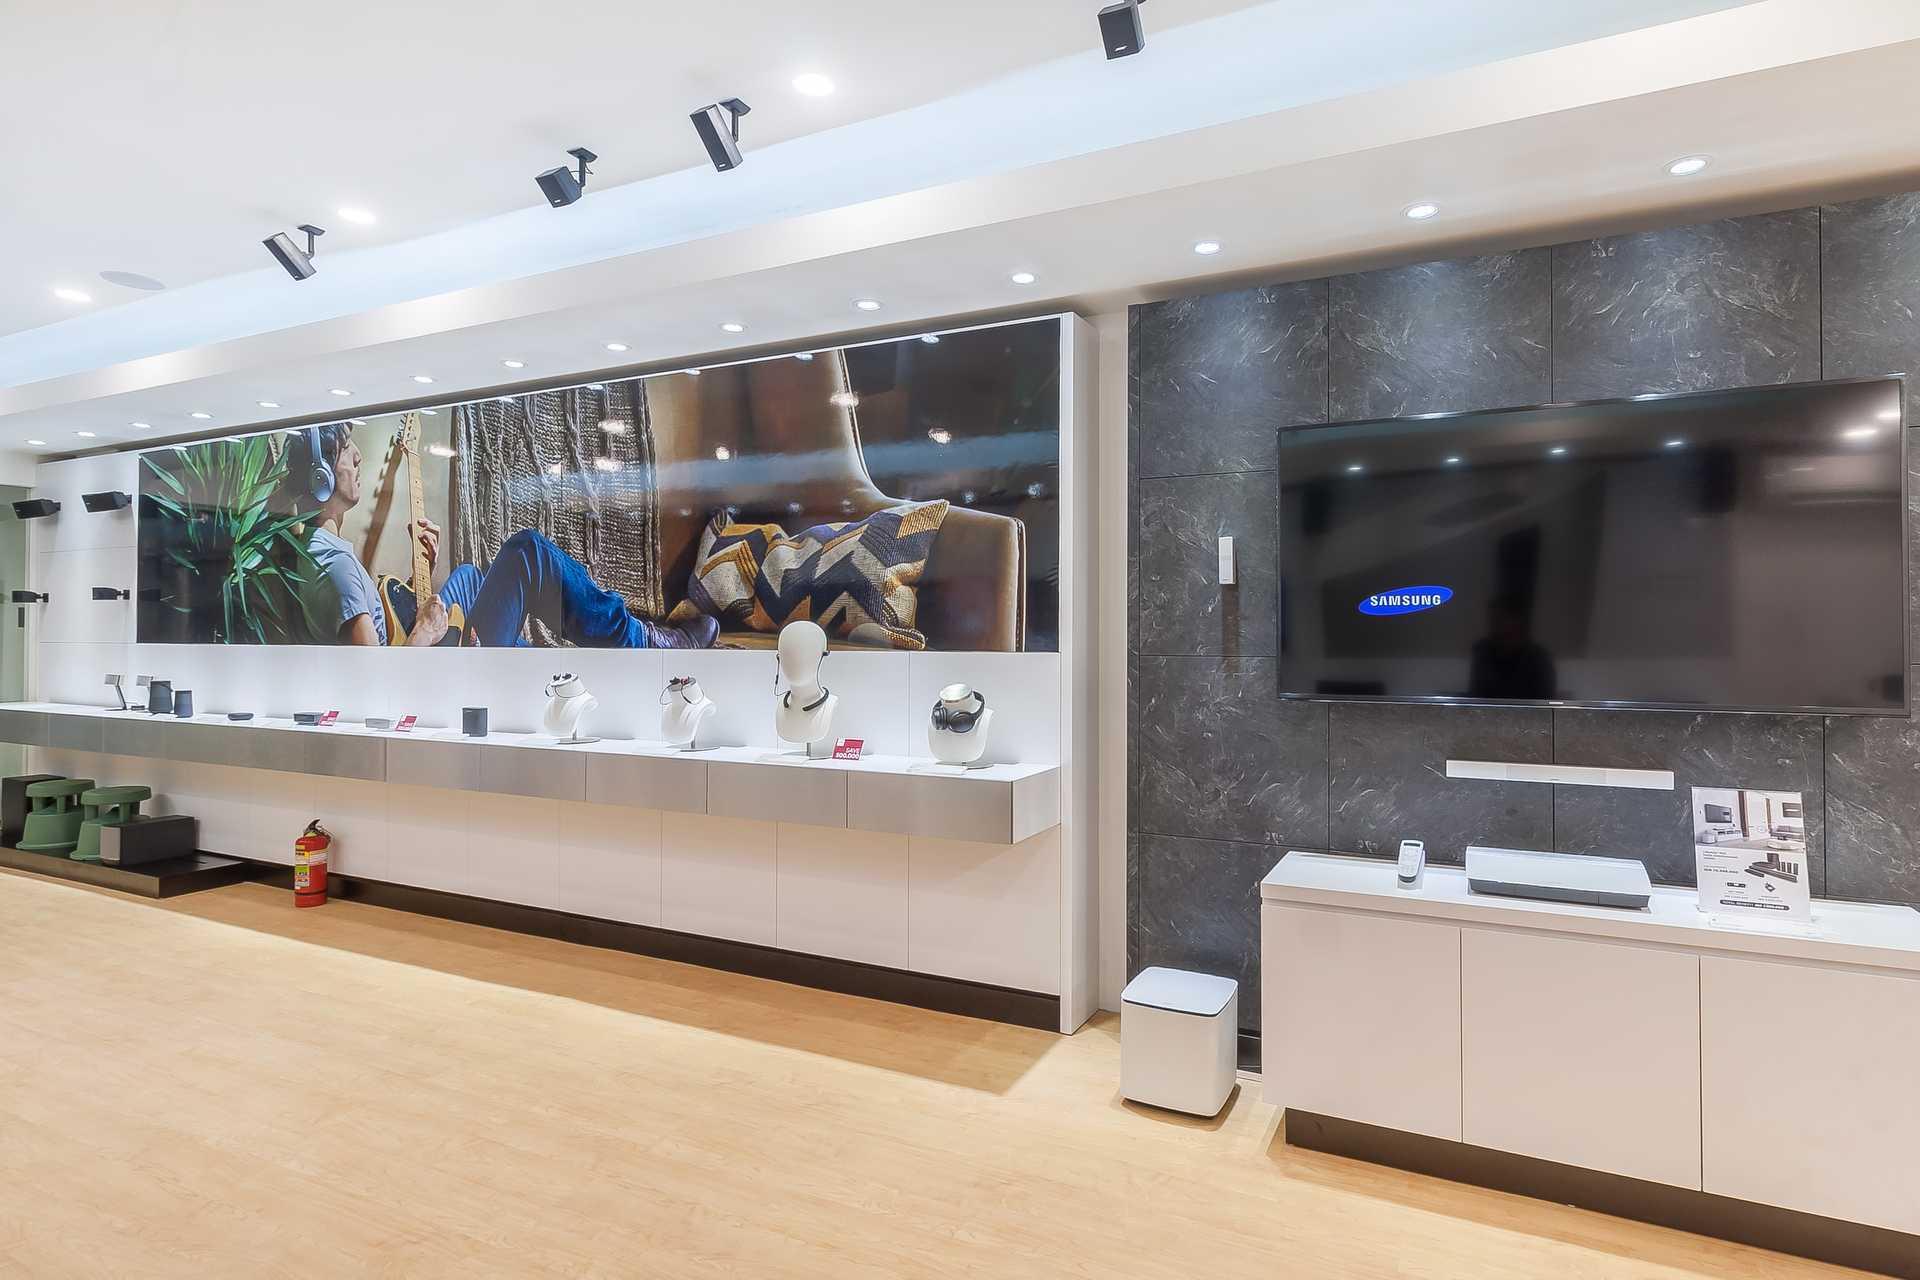 Asakiwari Bose Store Mall Bali Galeria Jl. By Pass Ngurah Rai, Kuta, Kabupaten Badung, Bali 80361, Indonesia Jl. By Pass Ngurah Rai, Kuta, Kabupaten Badung, Bali 80361, Indonesia Asakiwari-Bose-Store-Mall-Bali-Galeria  75786